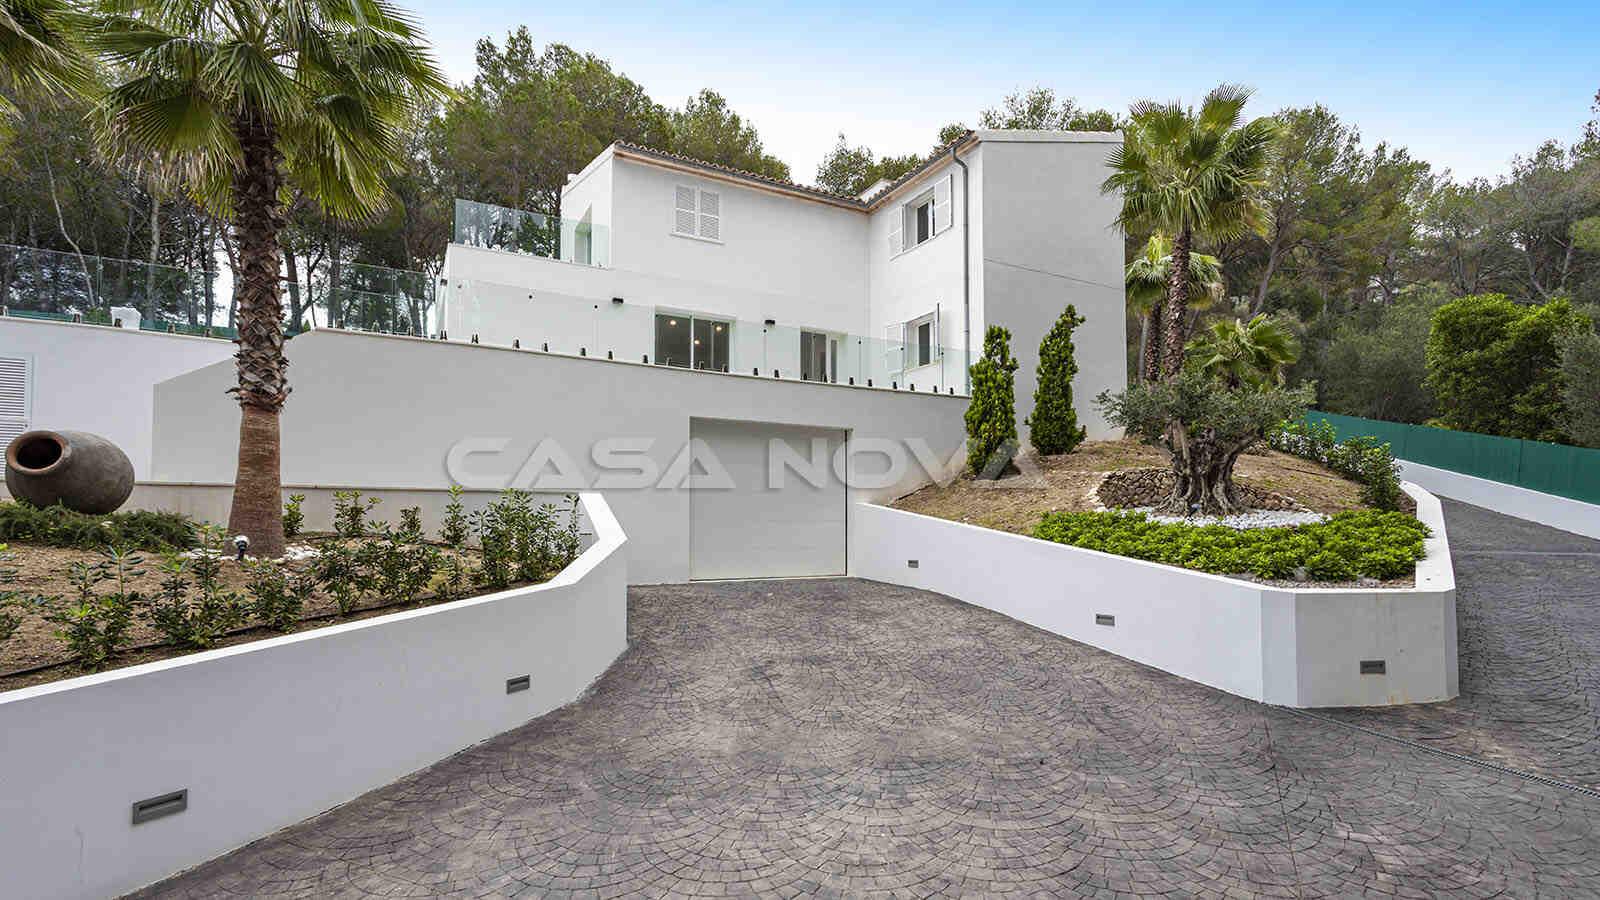 Moderne Mallorca Villa mit imposanter Auffahrt